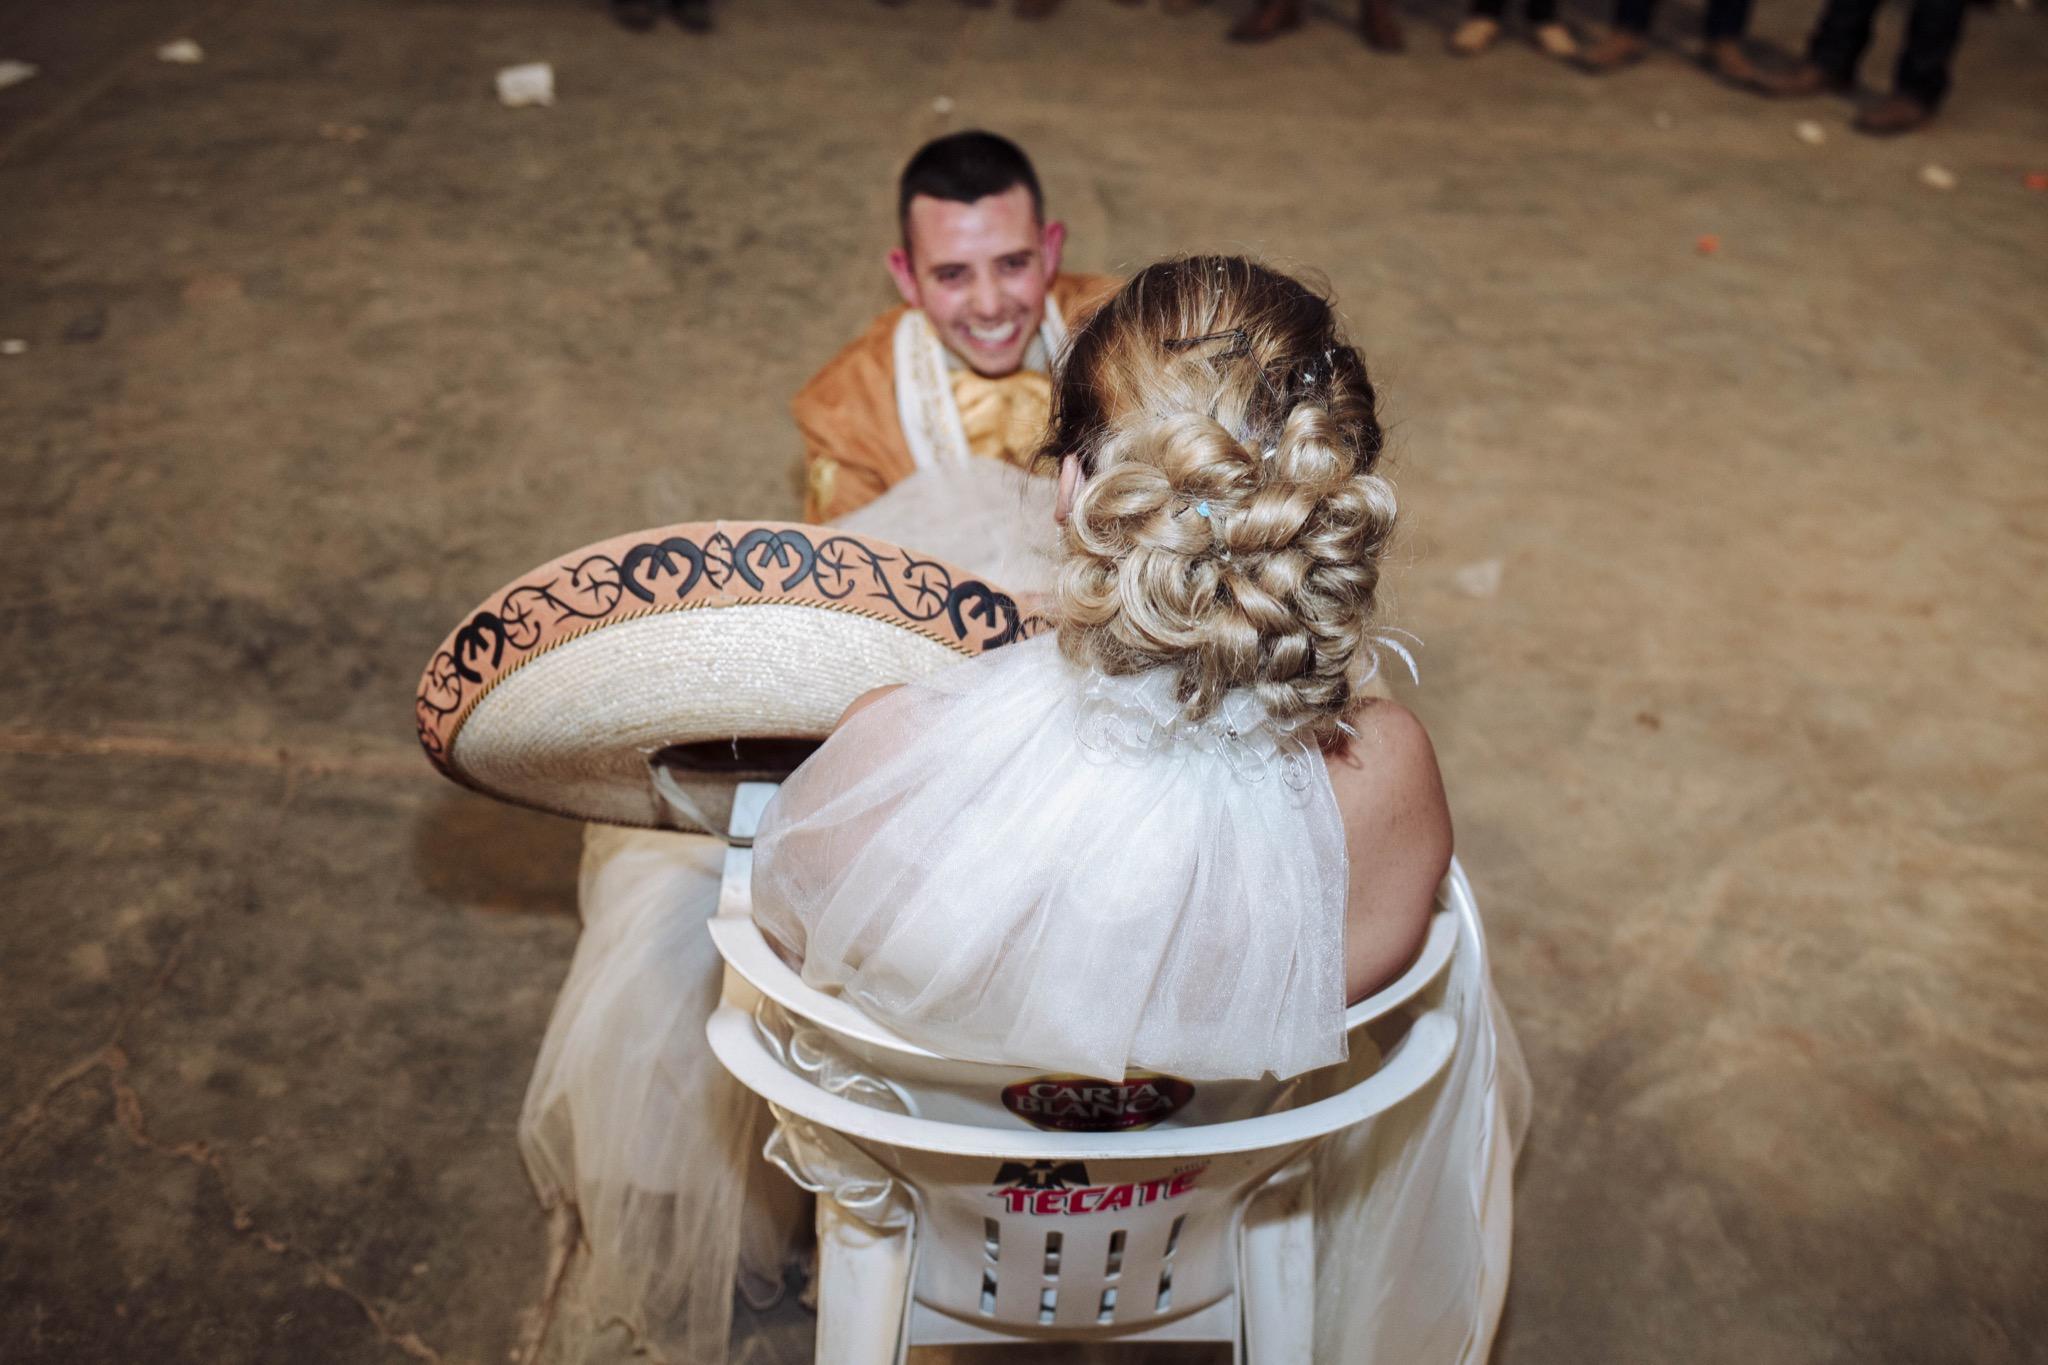 javier_noriega_fotografo_profesional_bodas_zacatecas_mexico_chihuahua_photographer_26